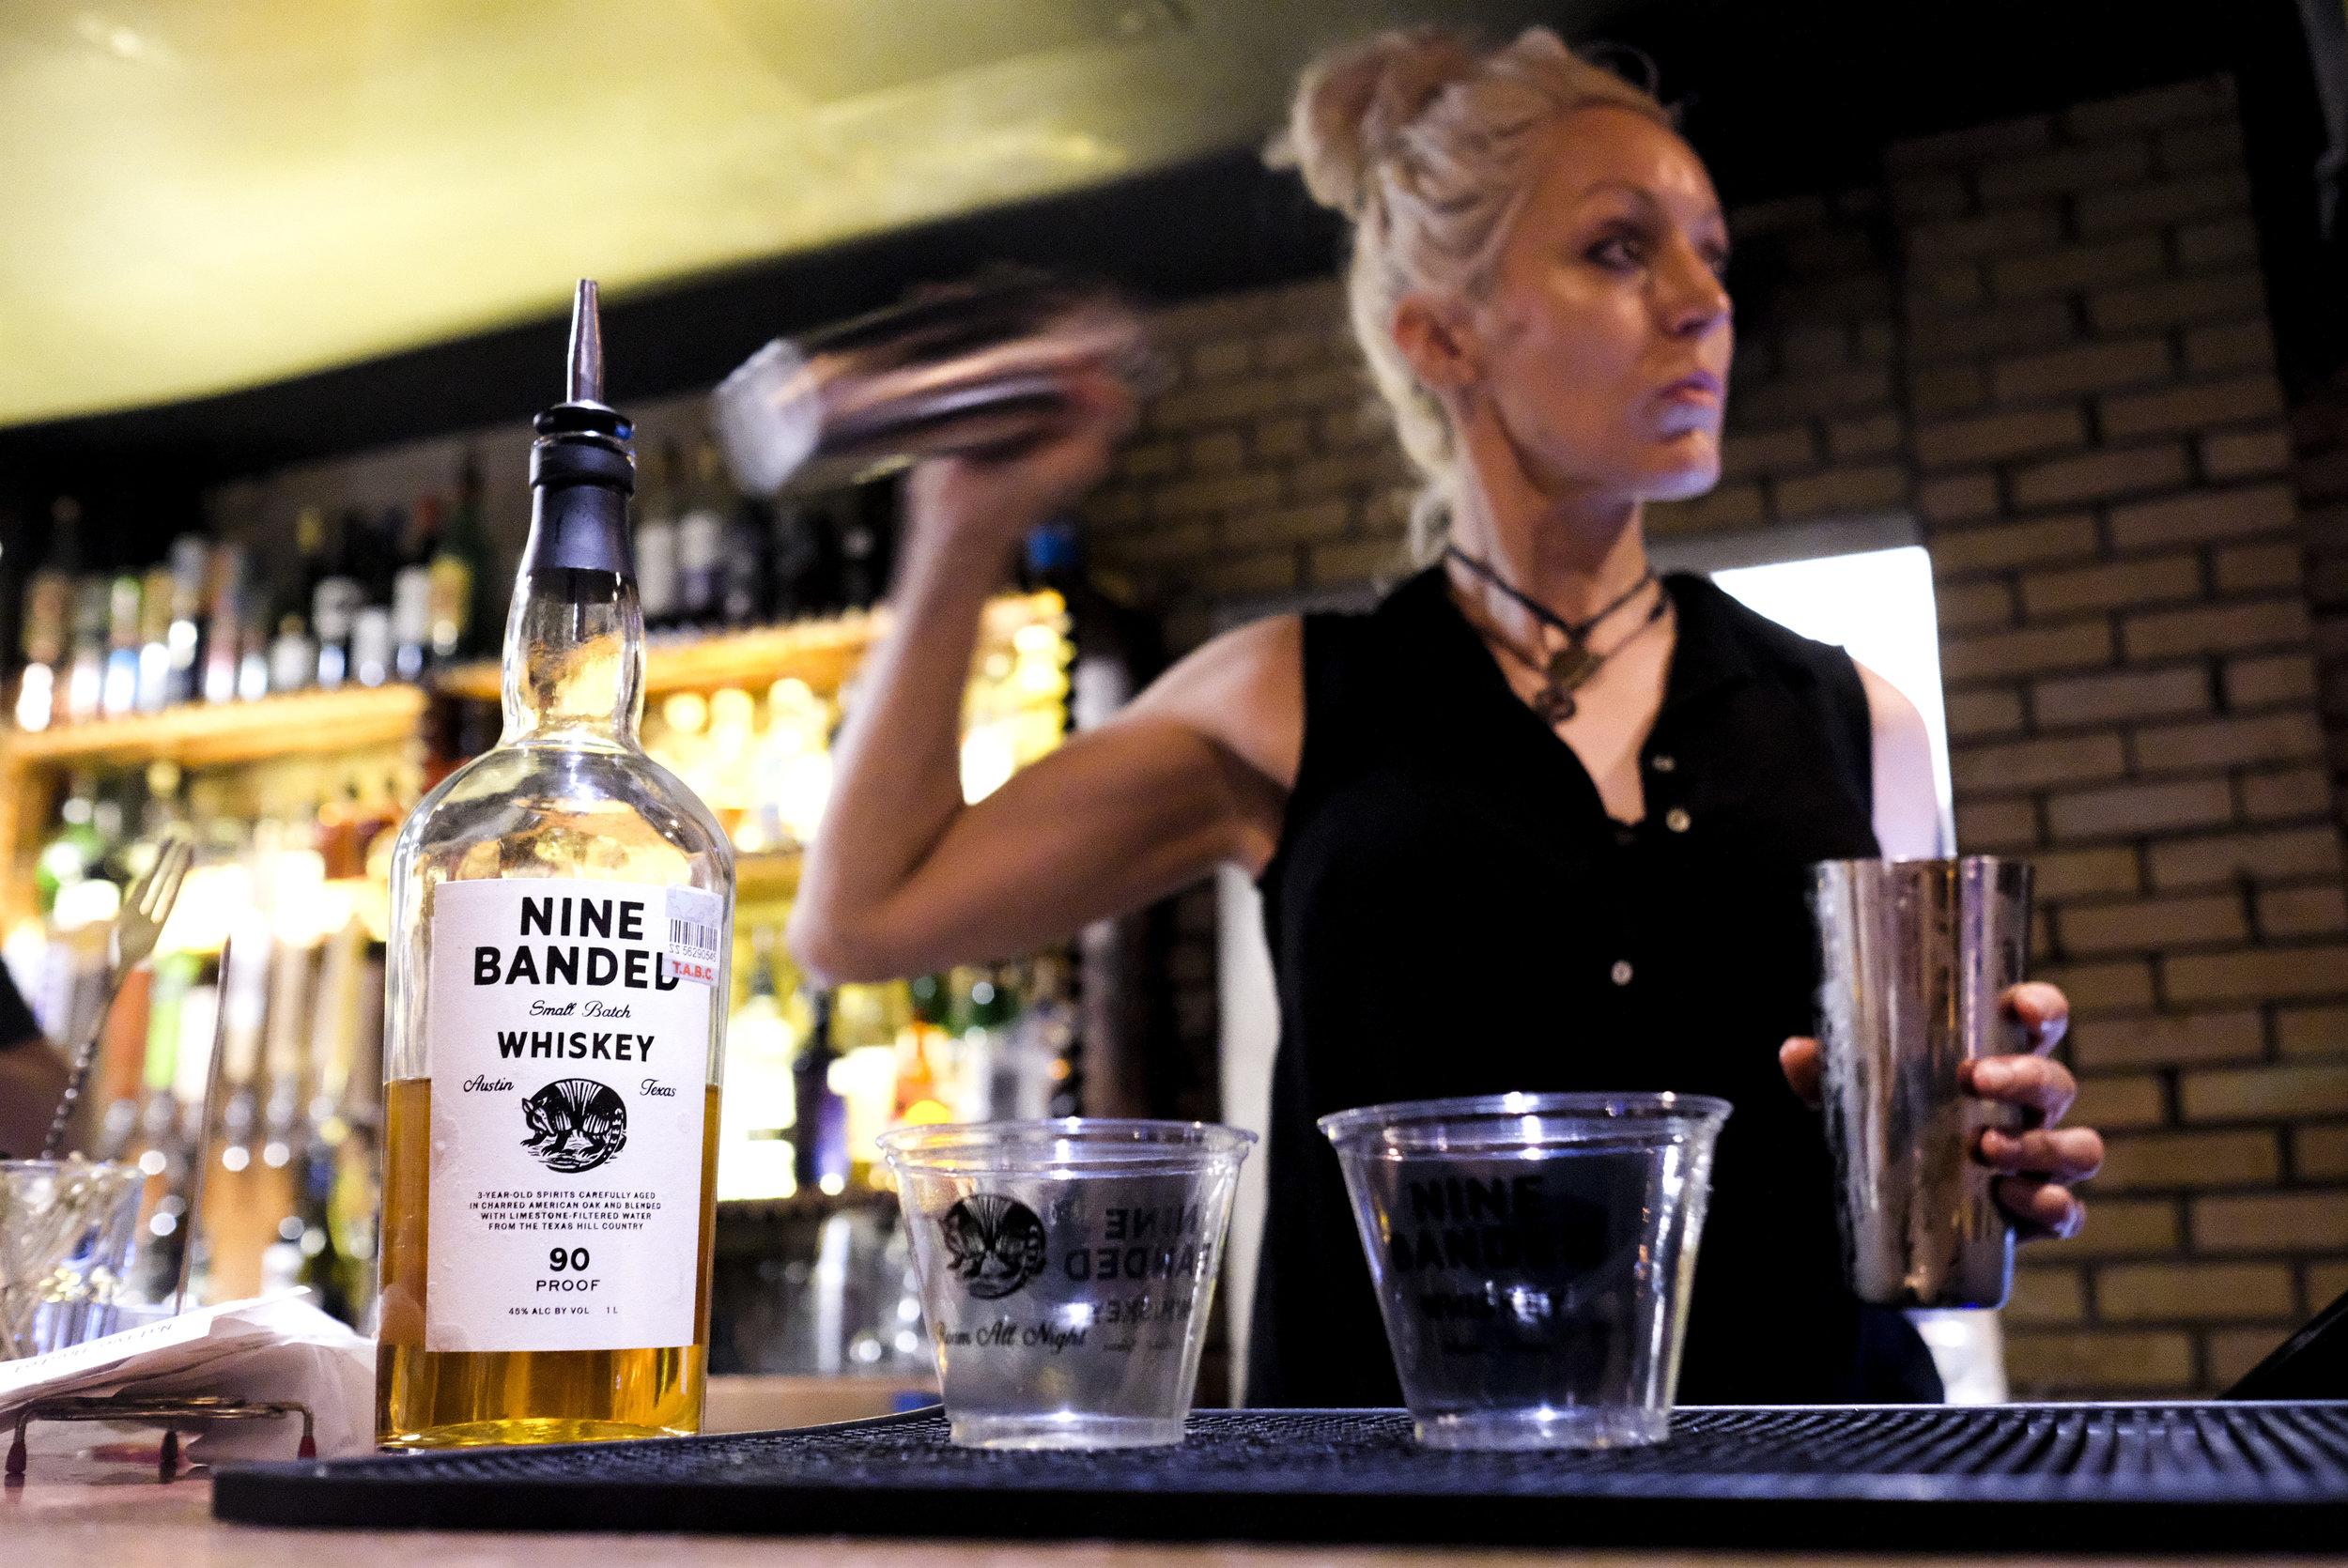 Nine_Banded_Whiskey_Austin_Texas_Native_Hostels_Live_Music_05.jpg